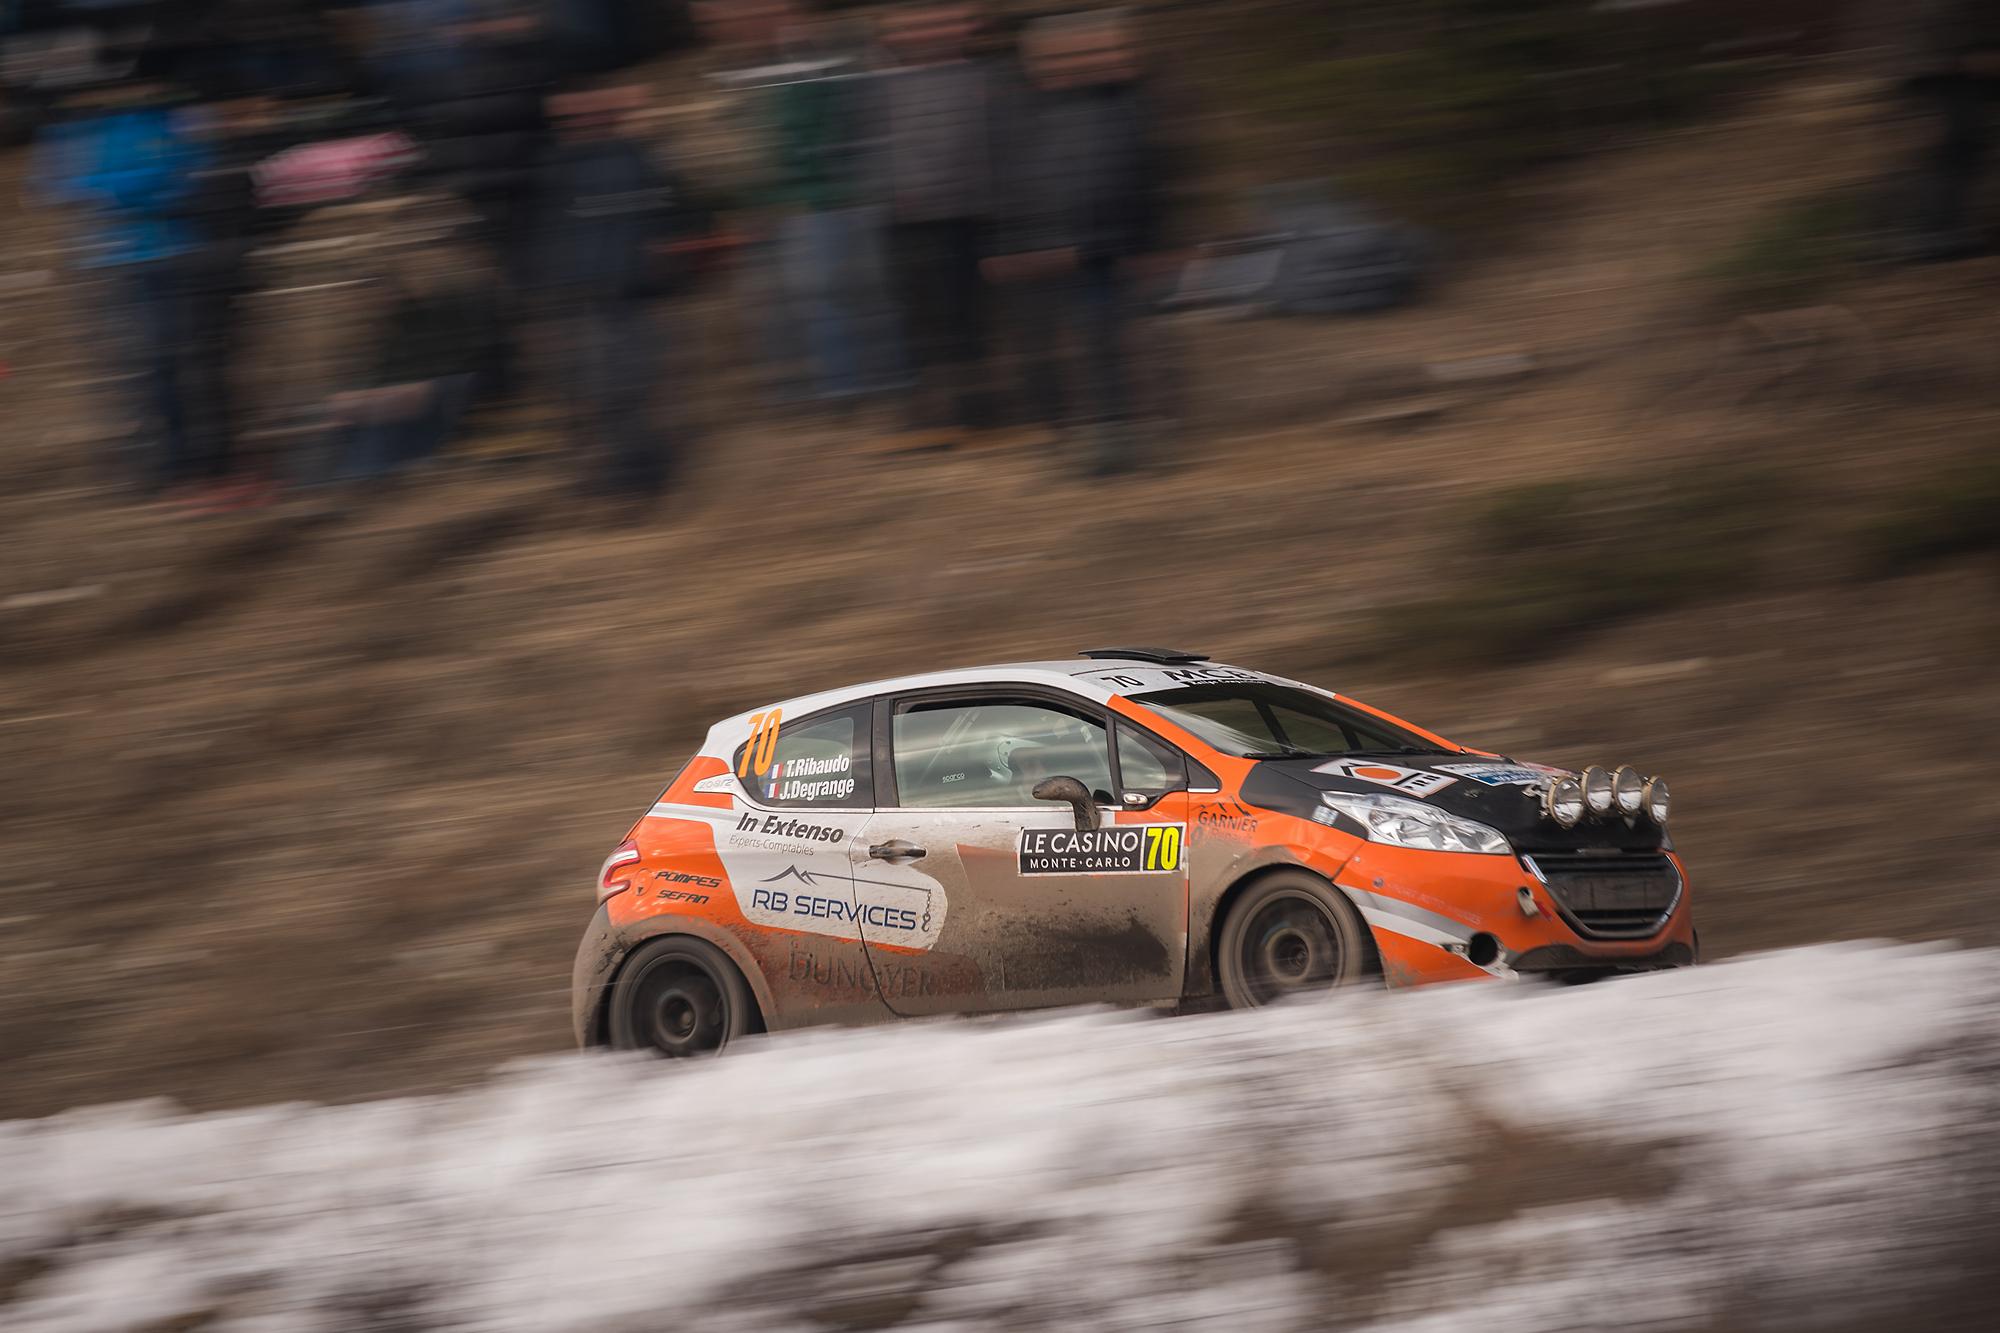 WRC Rallye de Monte carlo 2020 - Ribaudo/Degrange...